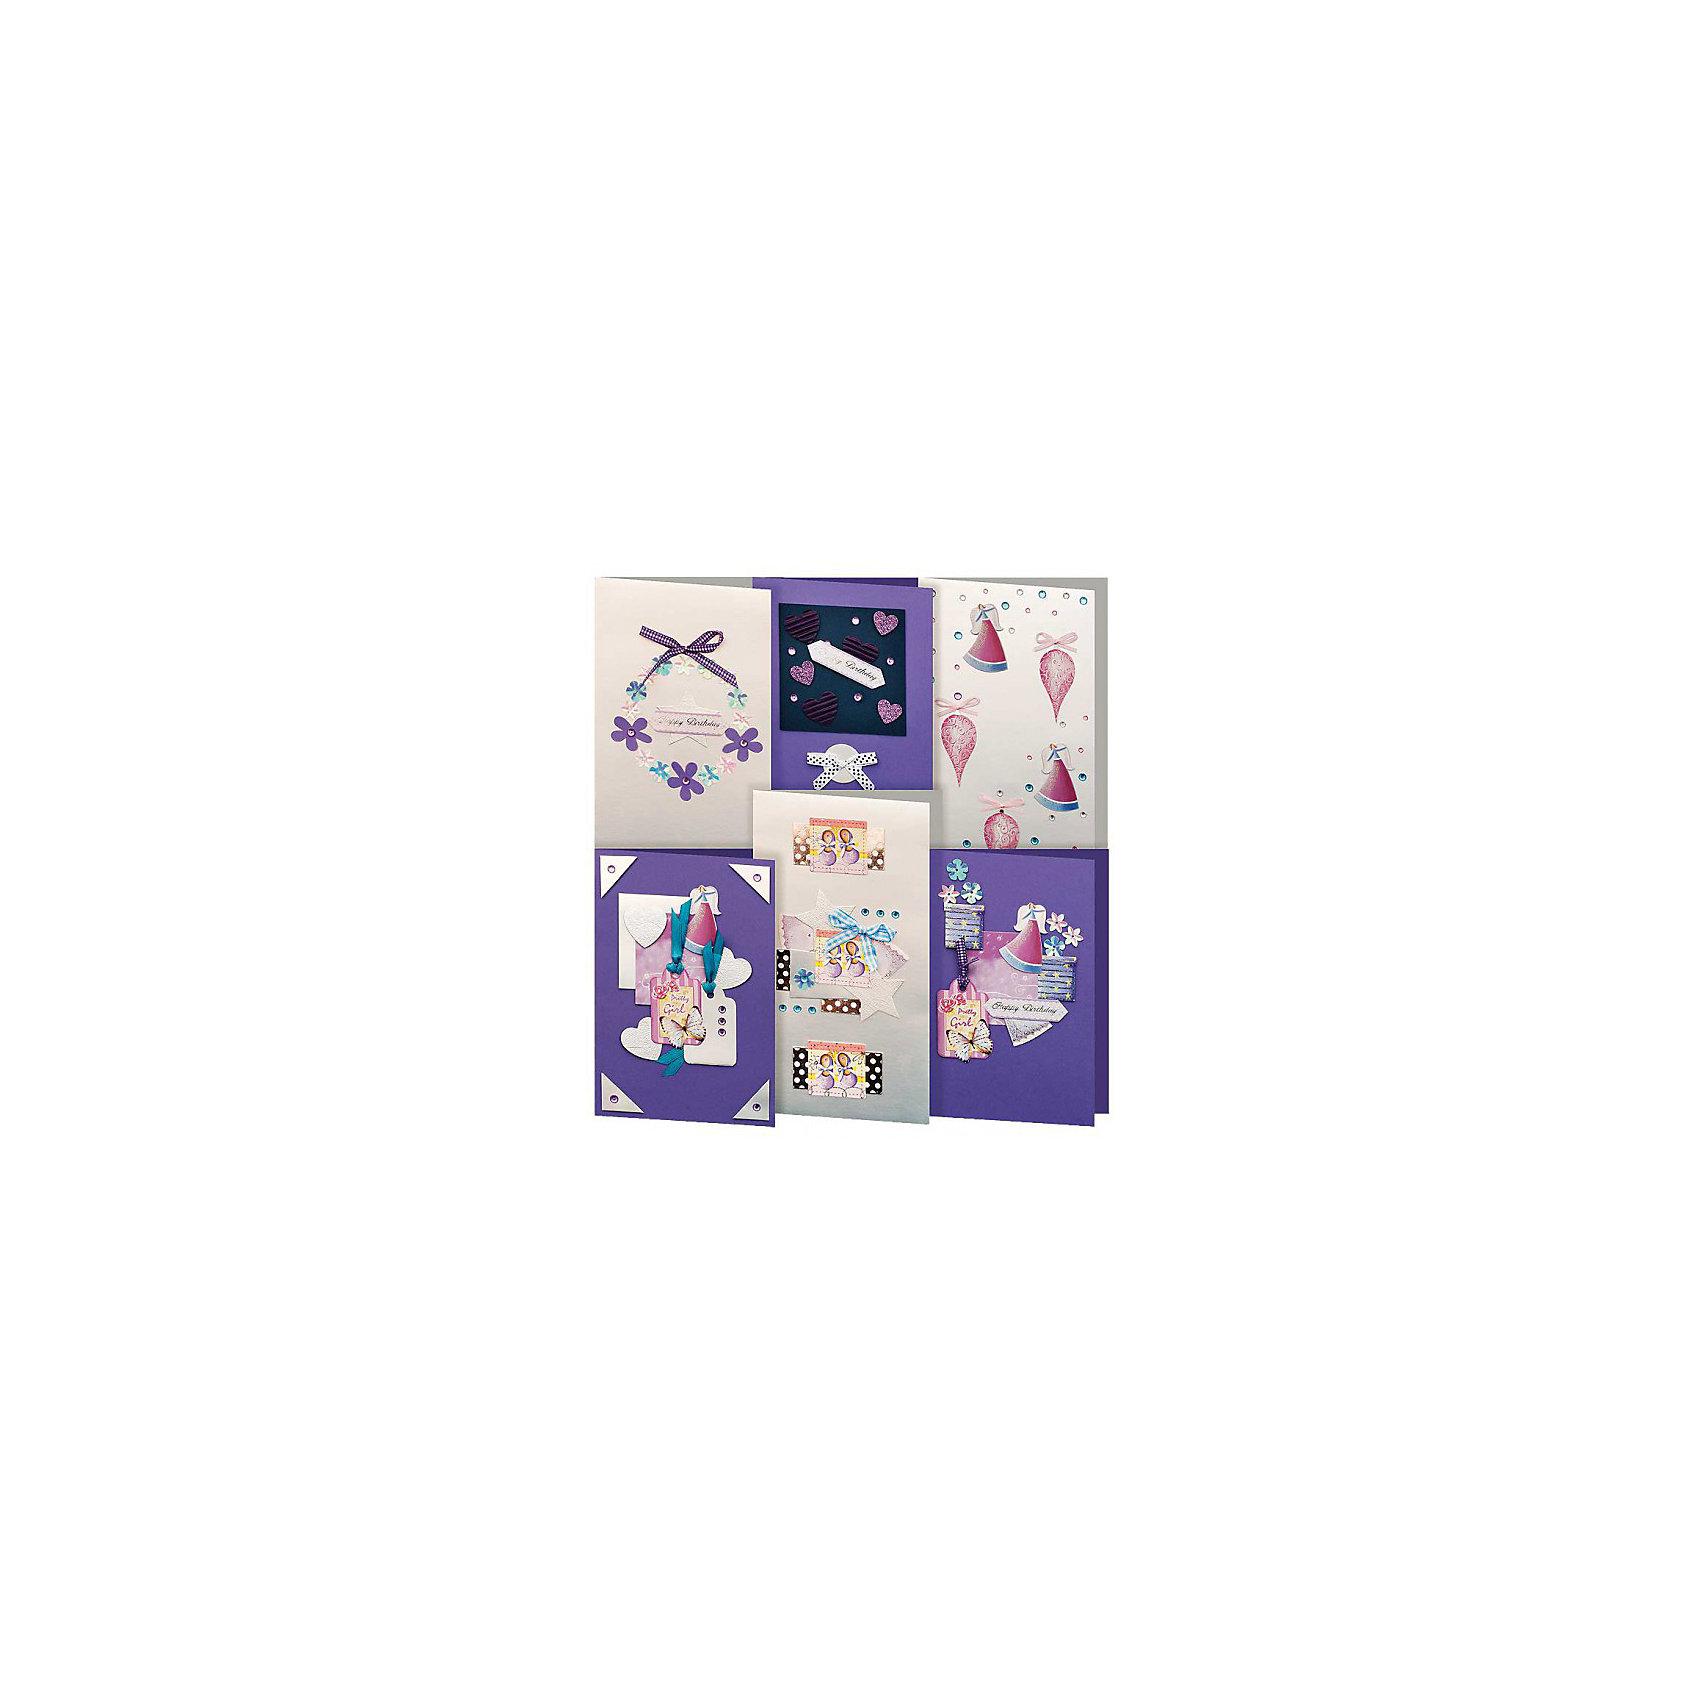 Скрапбукинг-набор для создания 6-ти открыток ПровансНаборы для скрапбукинга<br><br>Ширина мм: 270<br>Глубина мм: 150<br>Высота мм: 60<br>Вес г: 292<br>Возраст от месяцев: 72<br>Возраст до месяцев: 144<br>Пол: Унисекс<br>Возраст: Детский<br>SKU: 5089624